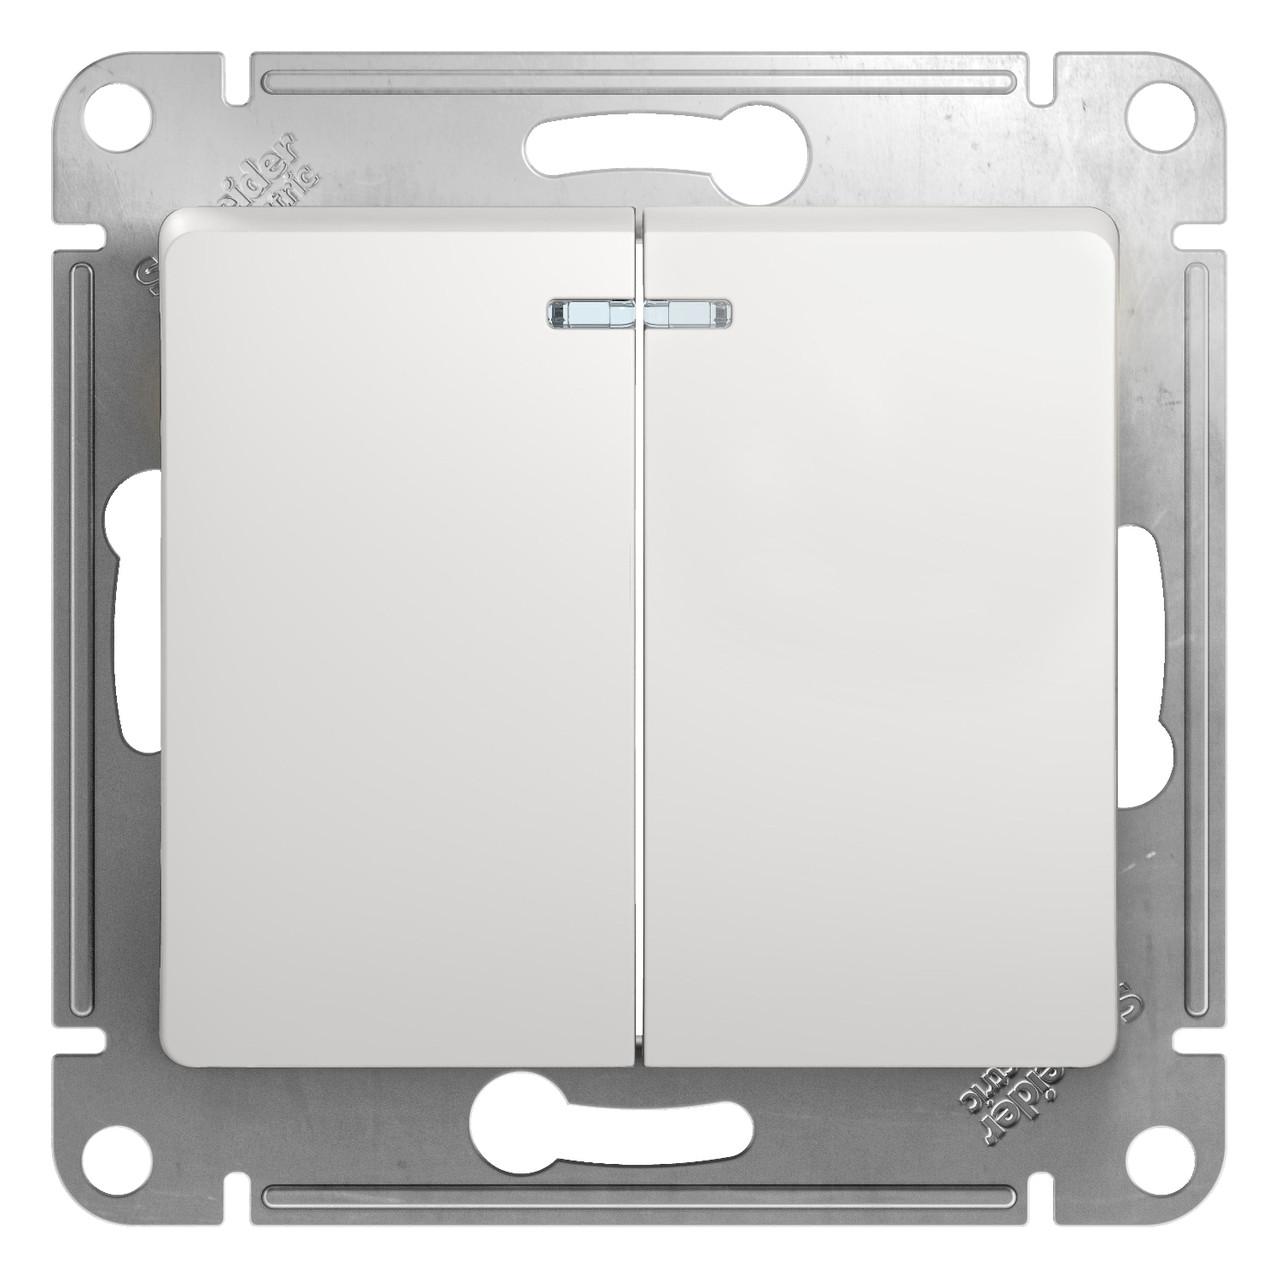 GSL000153 Glossa - 1-полюсн. 2-клавиш.выкл. с ламп. - механизм - 10 AX - белый